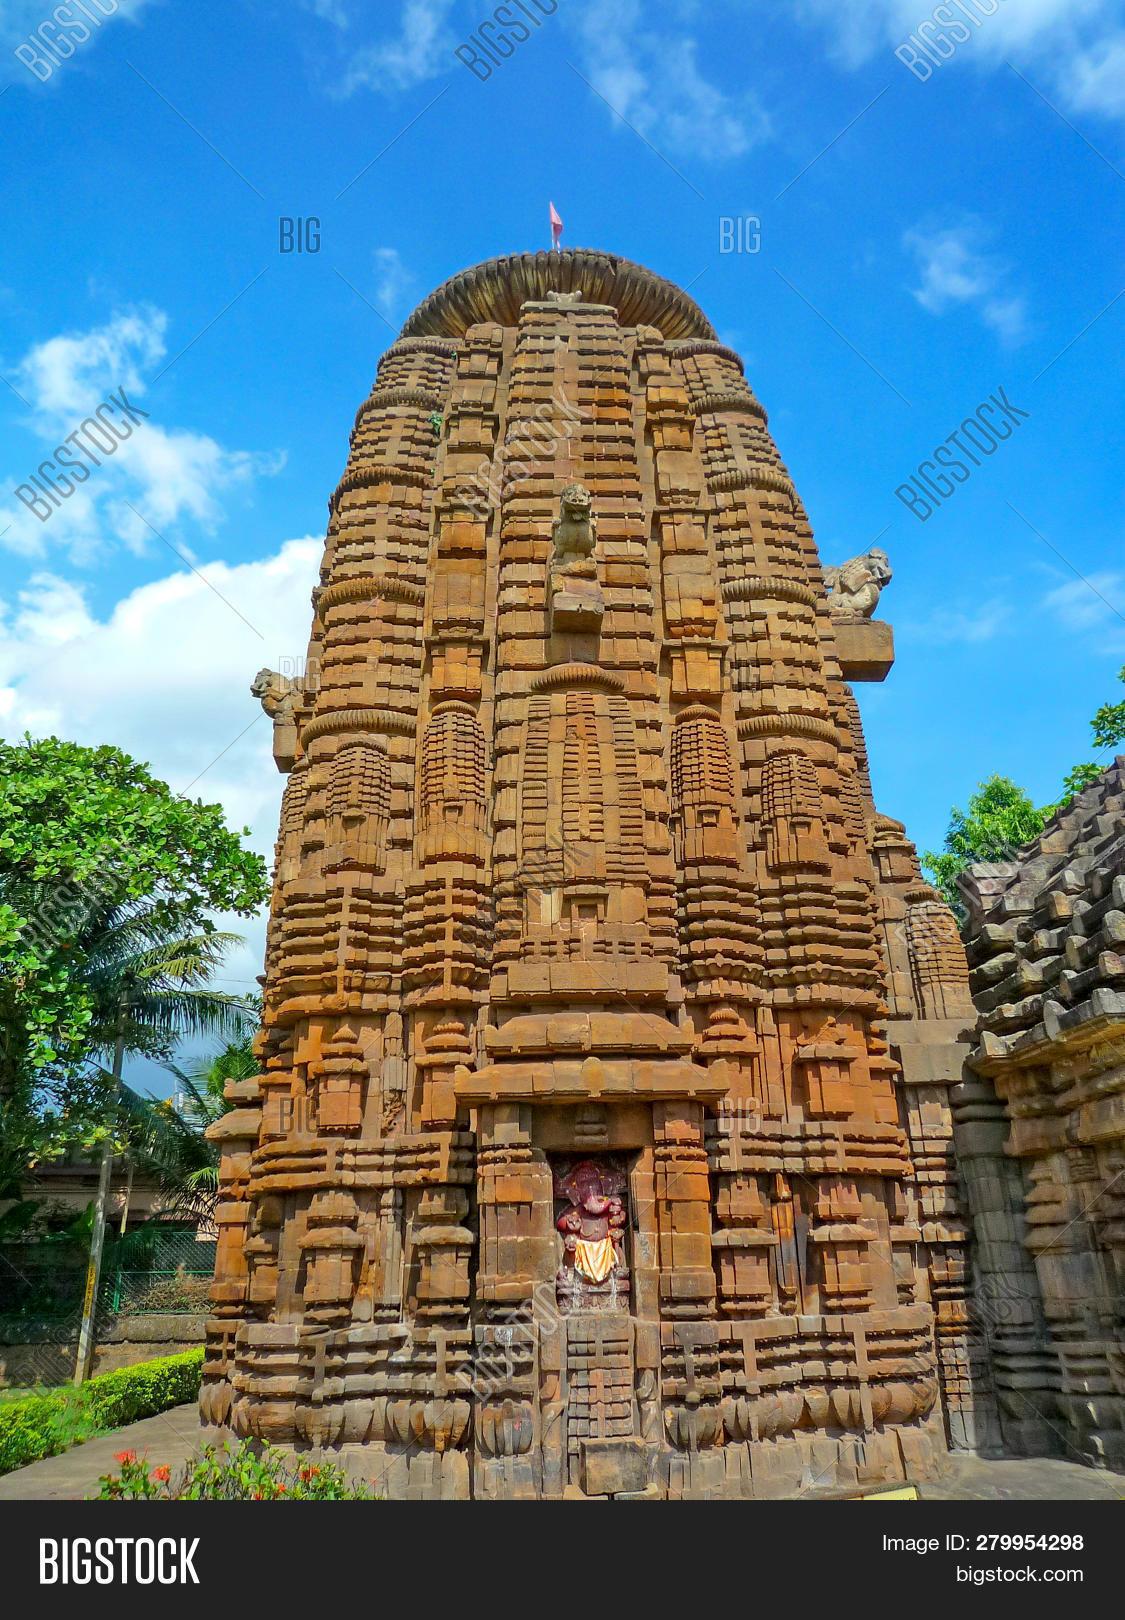 Background Hinduism Image & Photo (Free Trial) | Bigstock